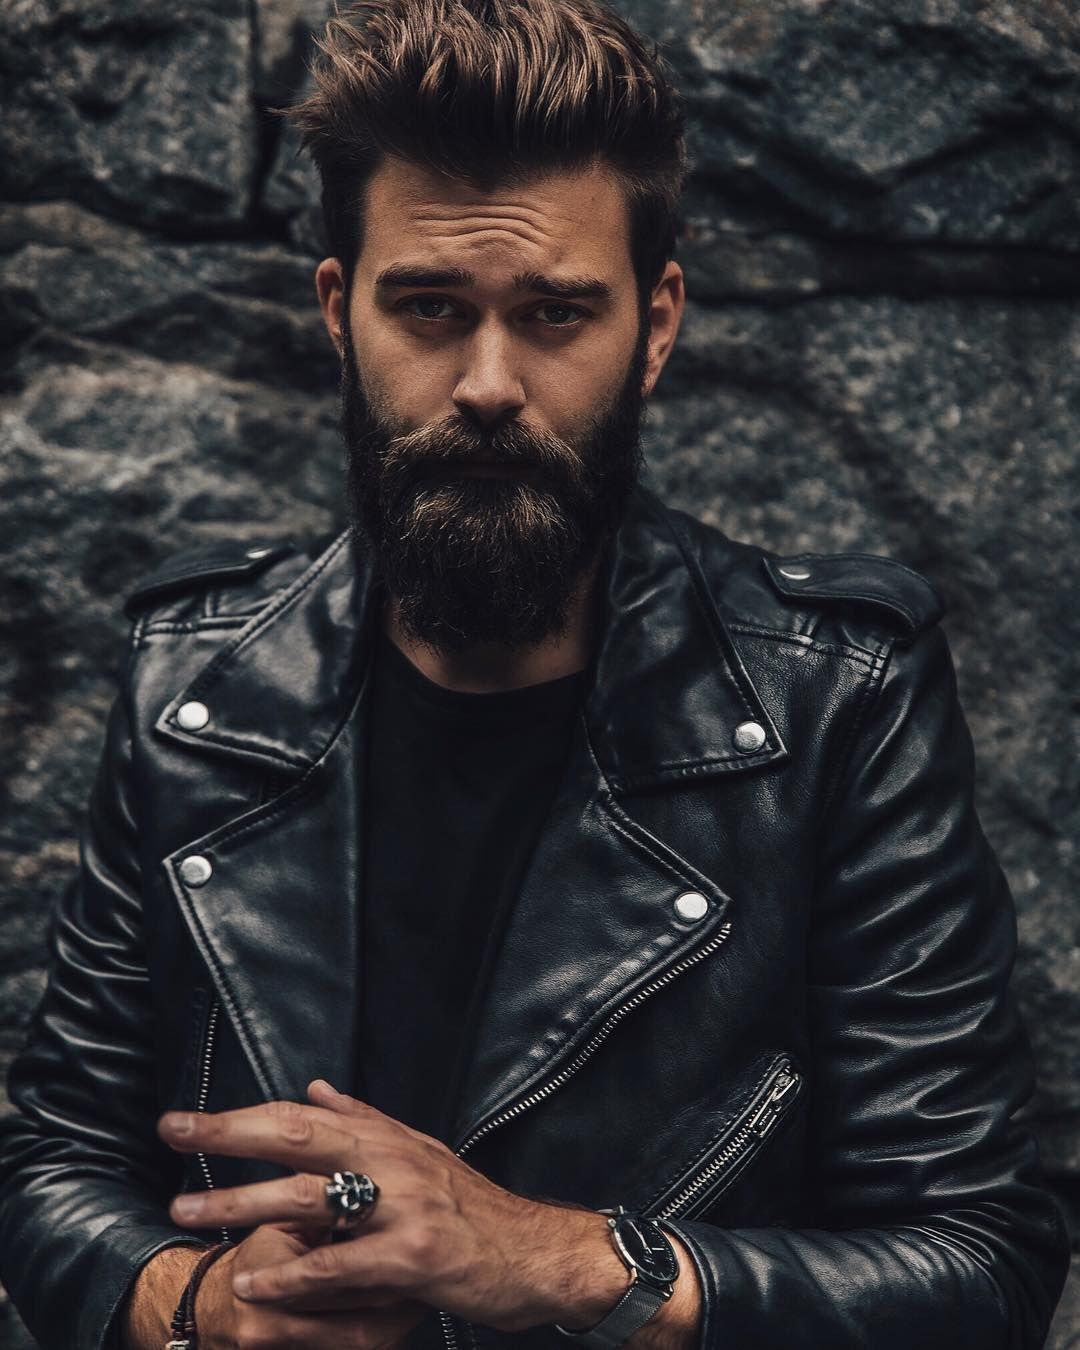 Black Leather Jacket And Beard Slackerblack Leather Jacket Leather Jacket Men Style Mens Fashion Rugged [ 1350 x 1080 Pixel ]